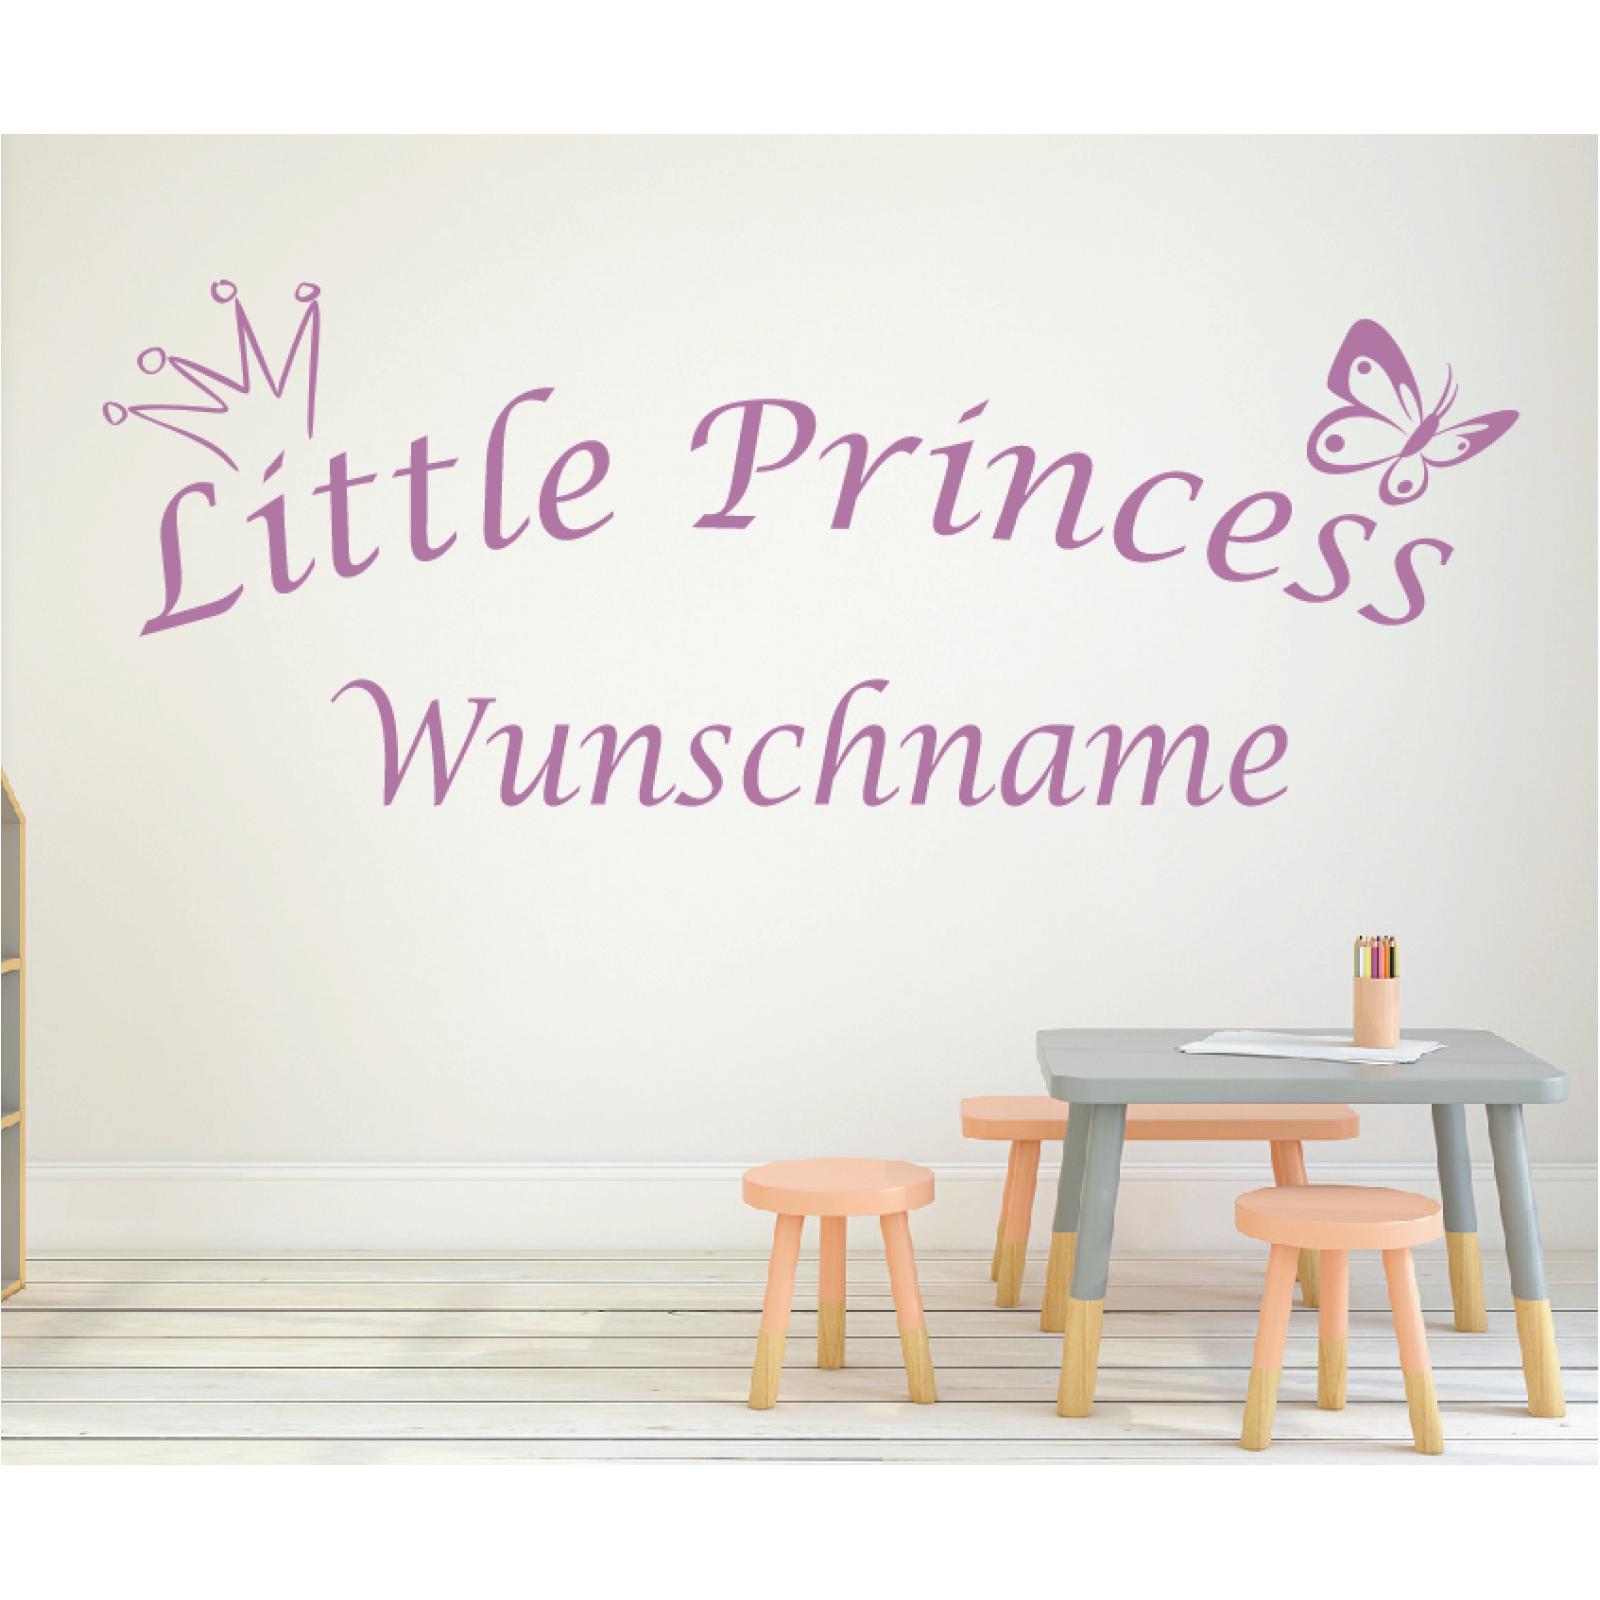 bis 100cm Wunschname Name Kindername Zimmer Aufkleber Sticker Wandtattoo No.22